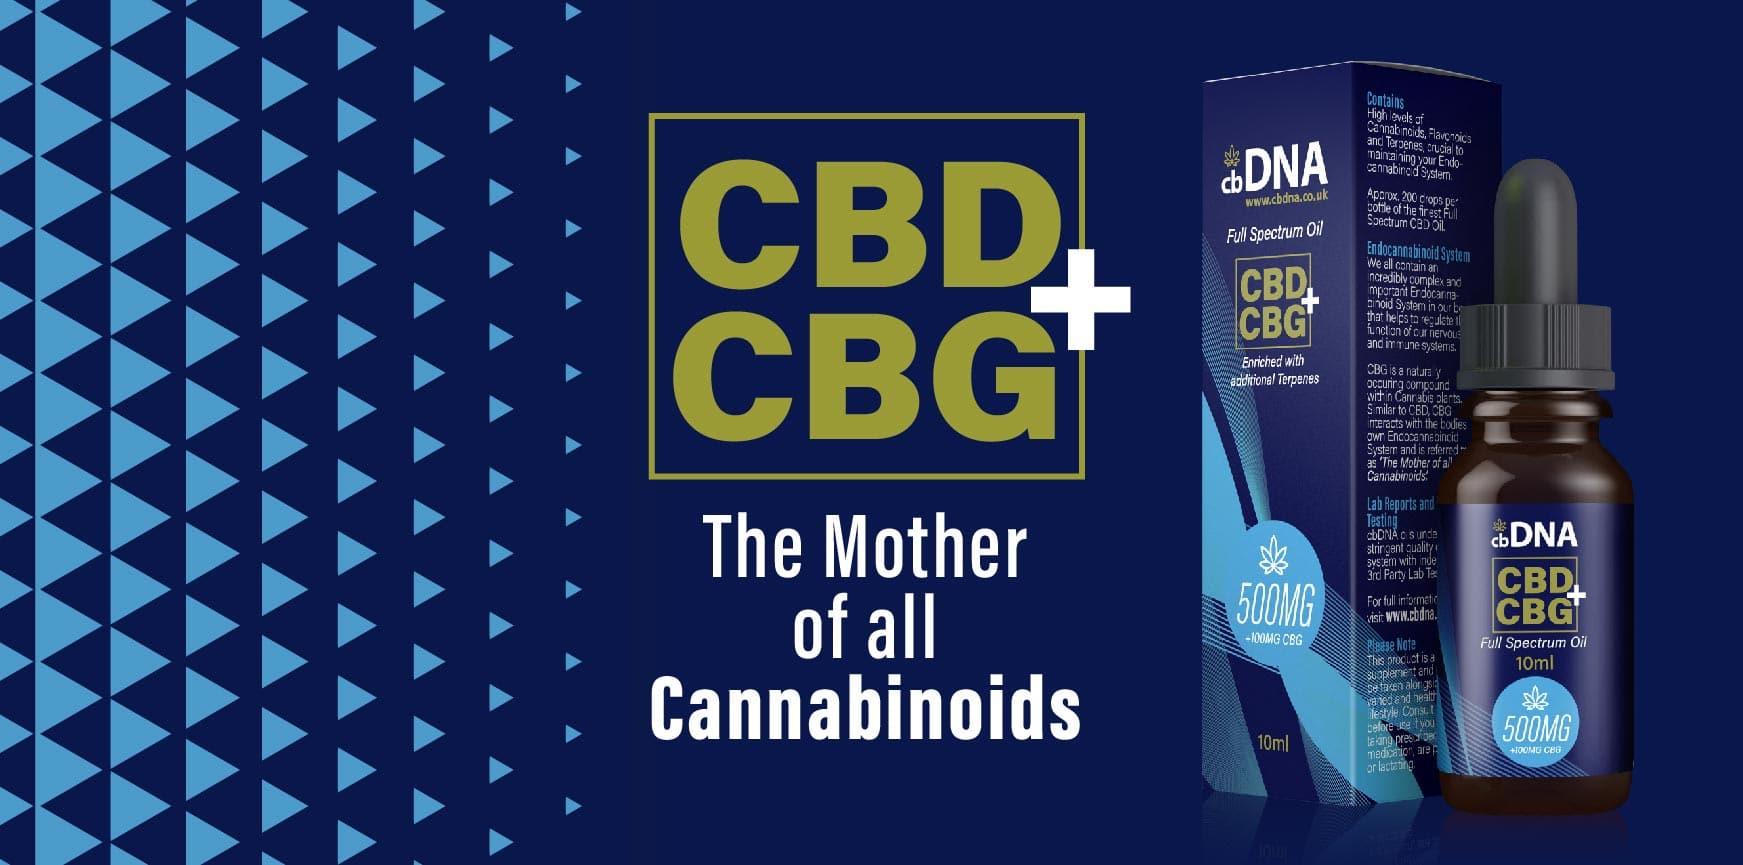 cbDNA CBG Oil Cannabinoids CBD 08